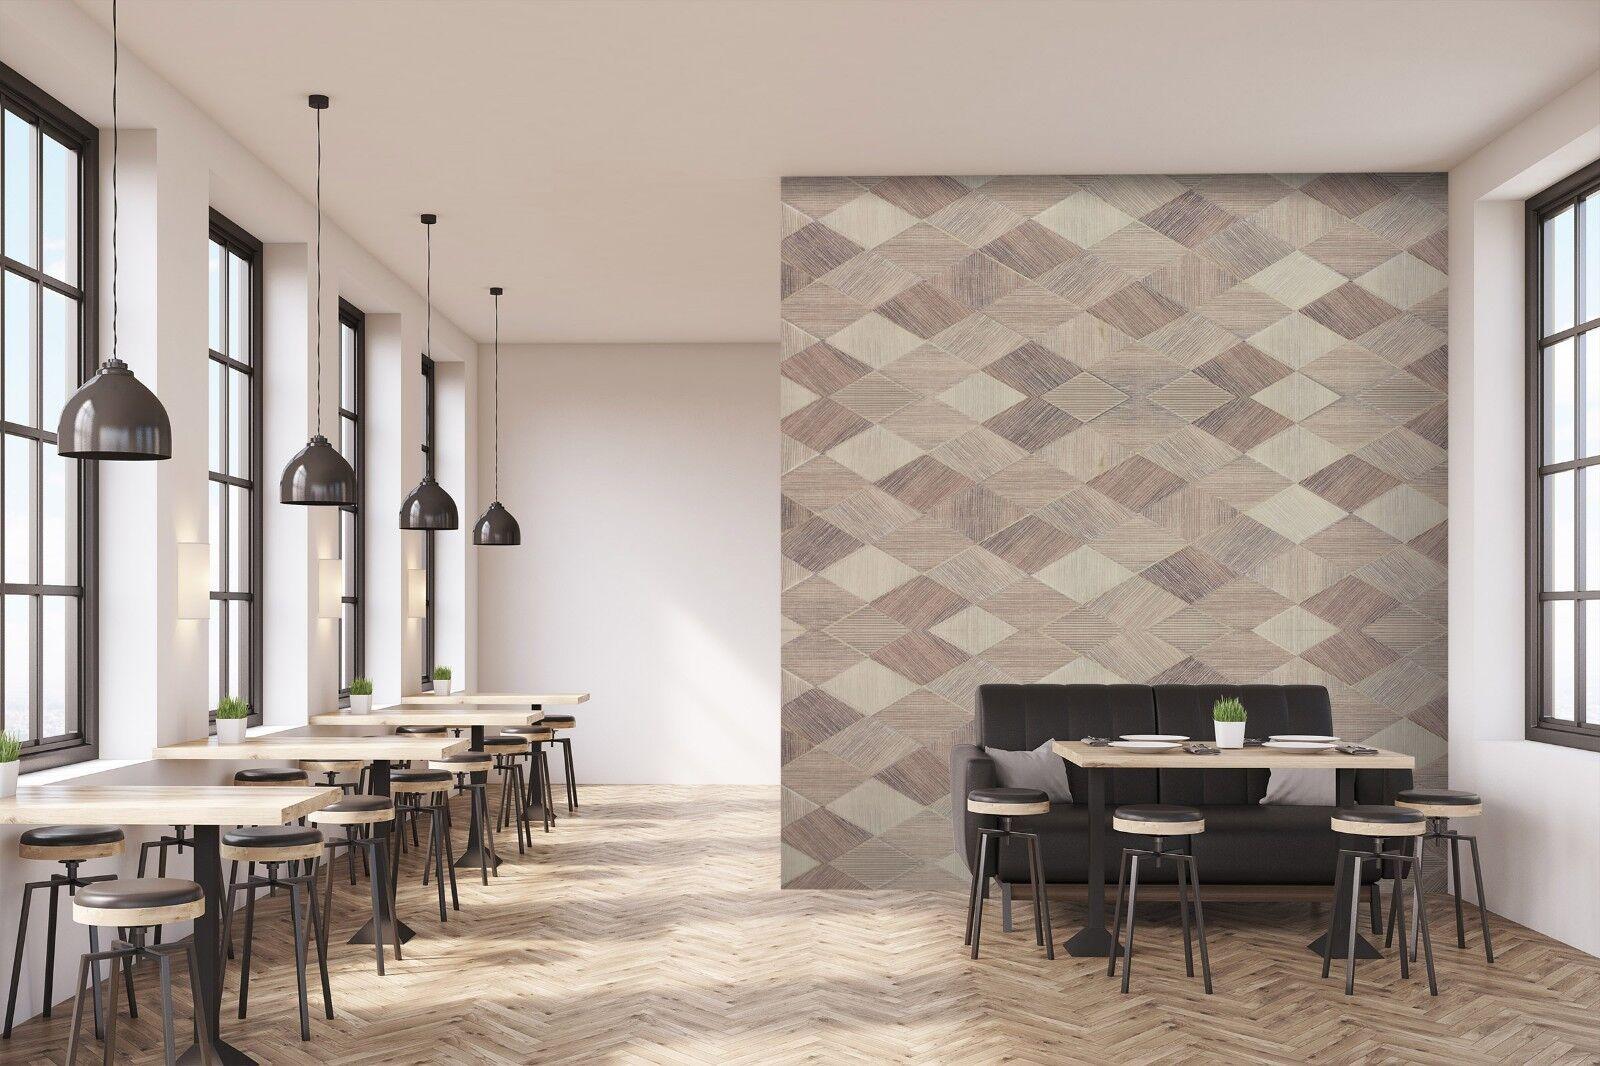 3D Diamond Wood Grain 7 Texture Tiles Marble Wall Paper Decal Wallpaper Mural AJ